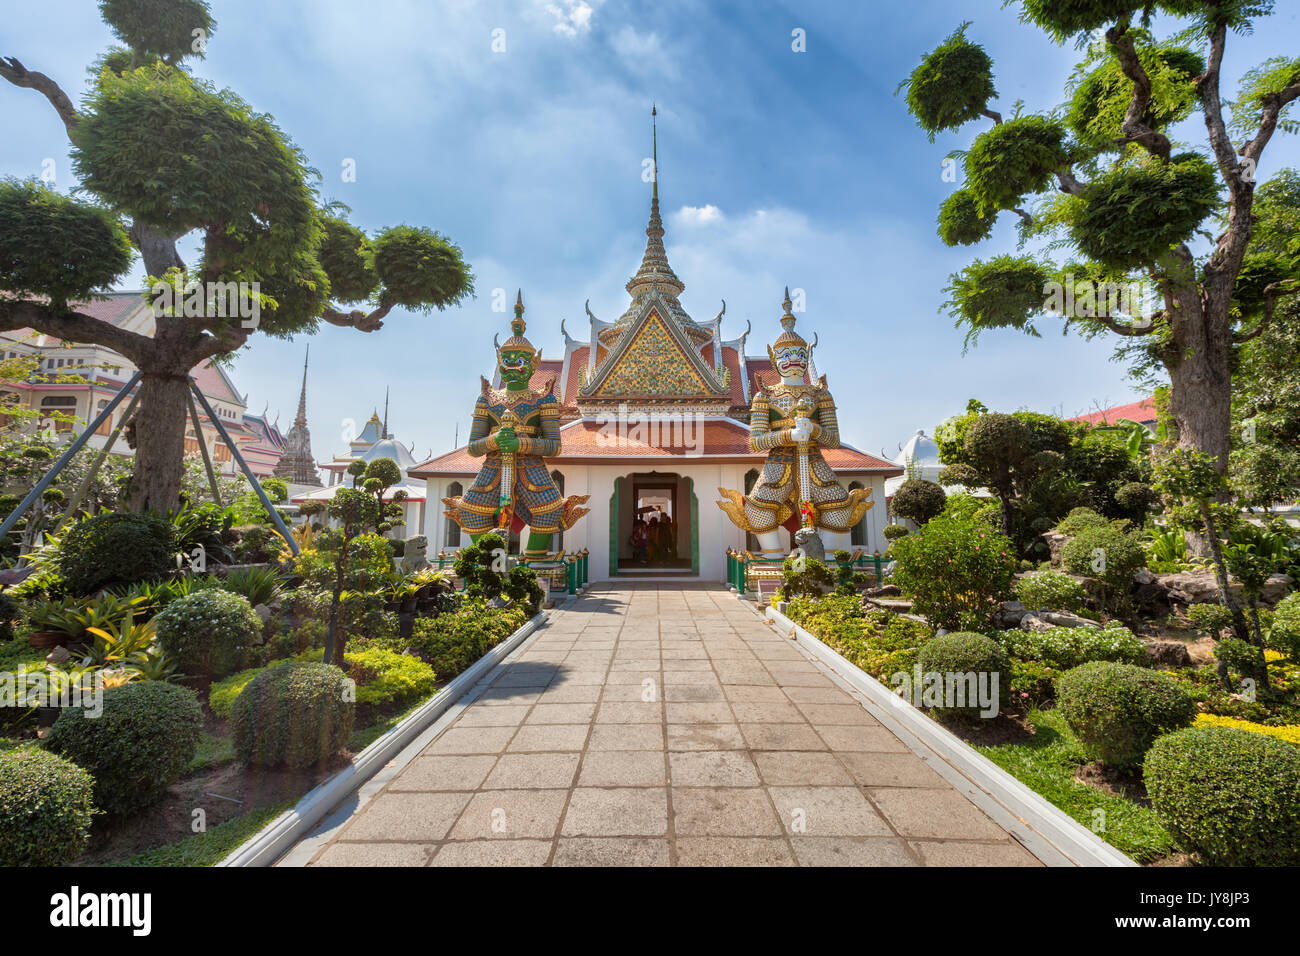 Giant demon guardian statues at the entrance of Wat Arun, Bangkok, Thailand - Stock Image